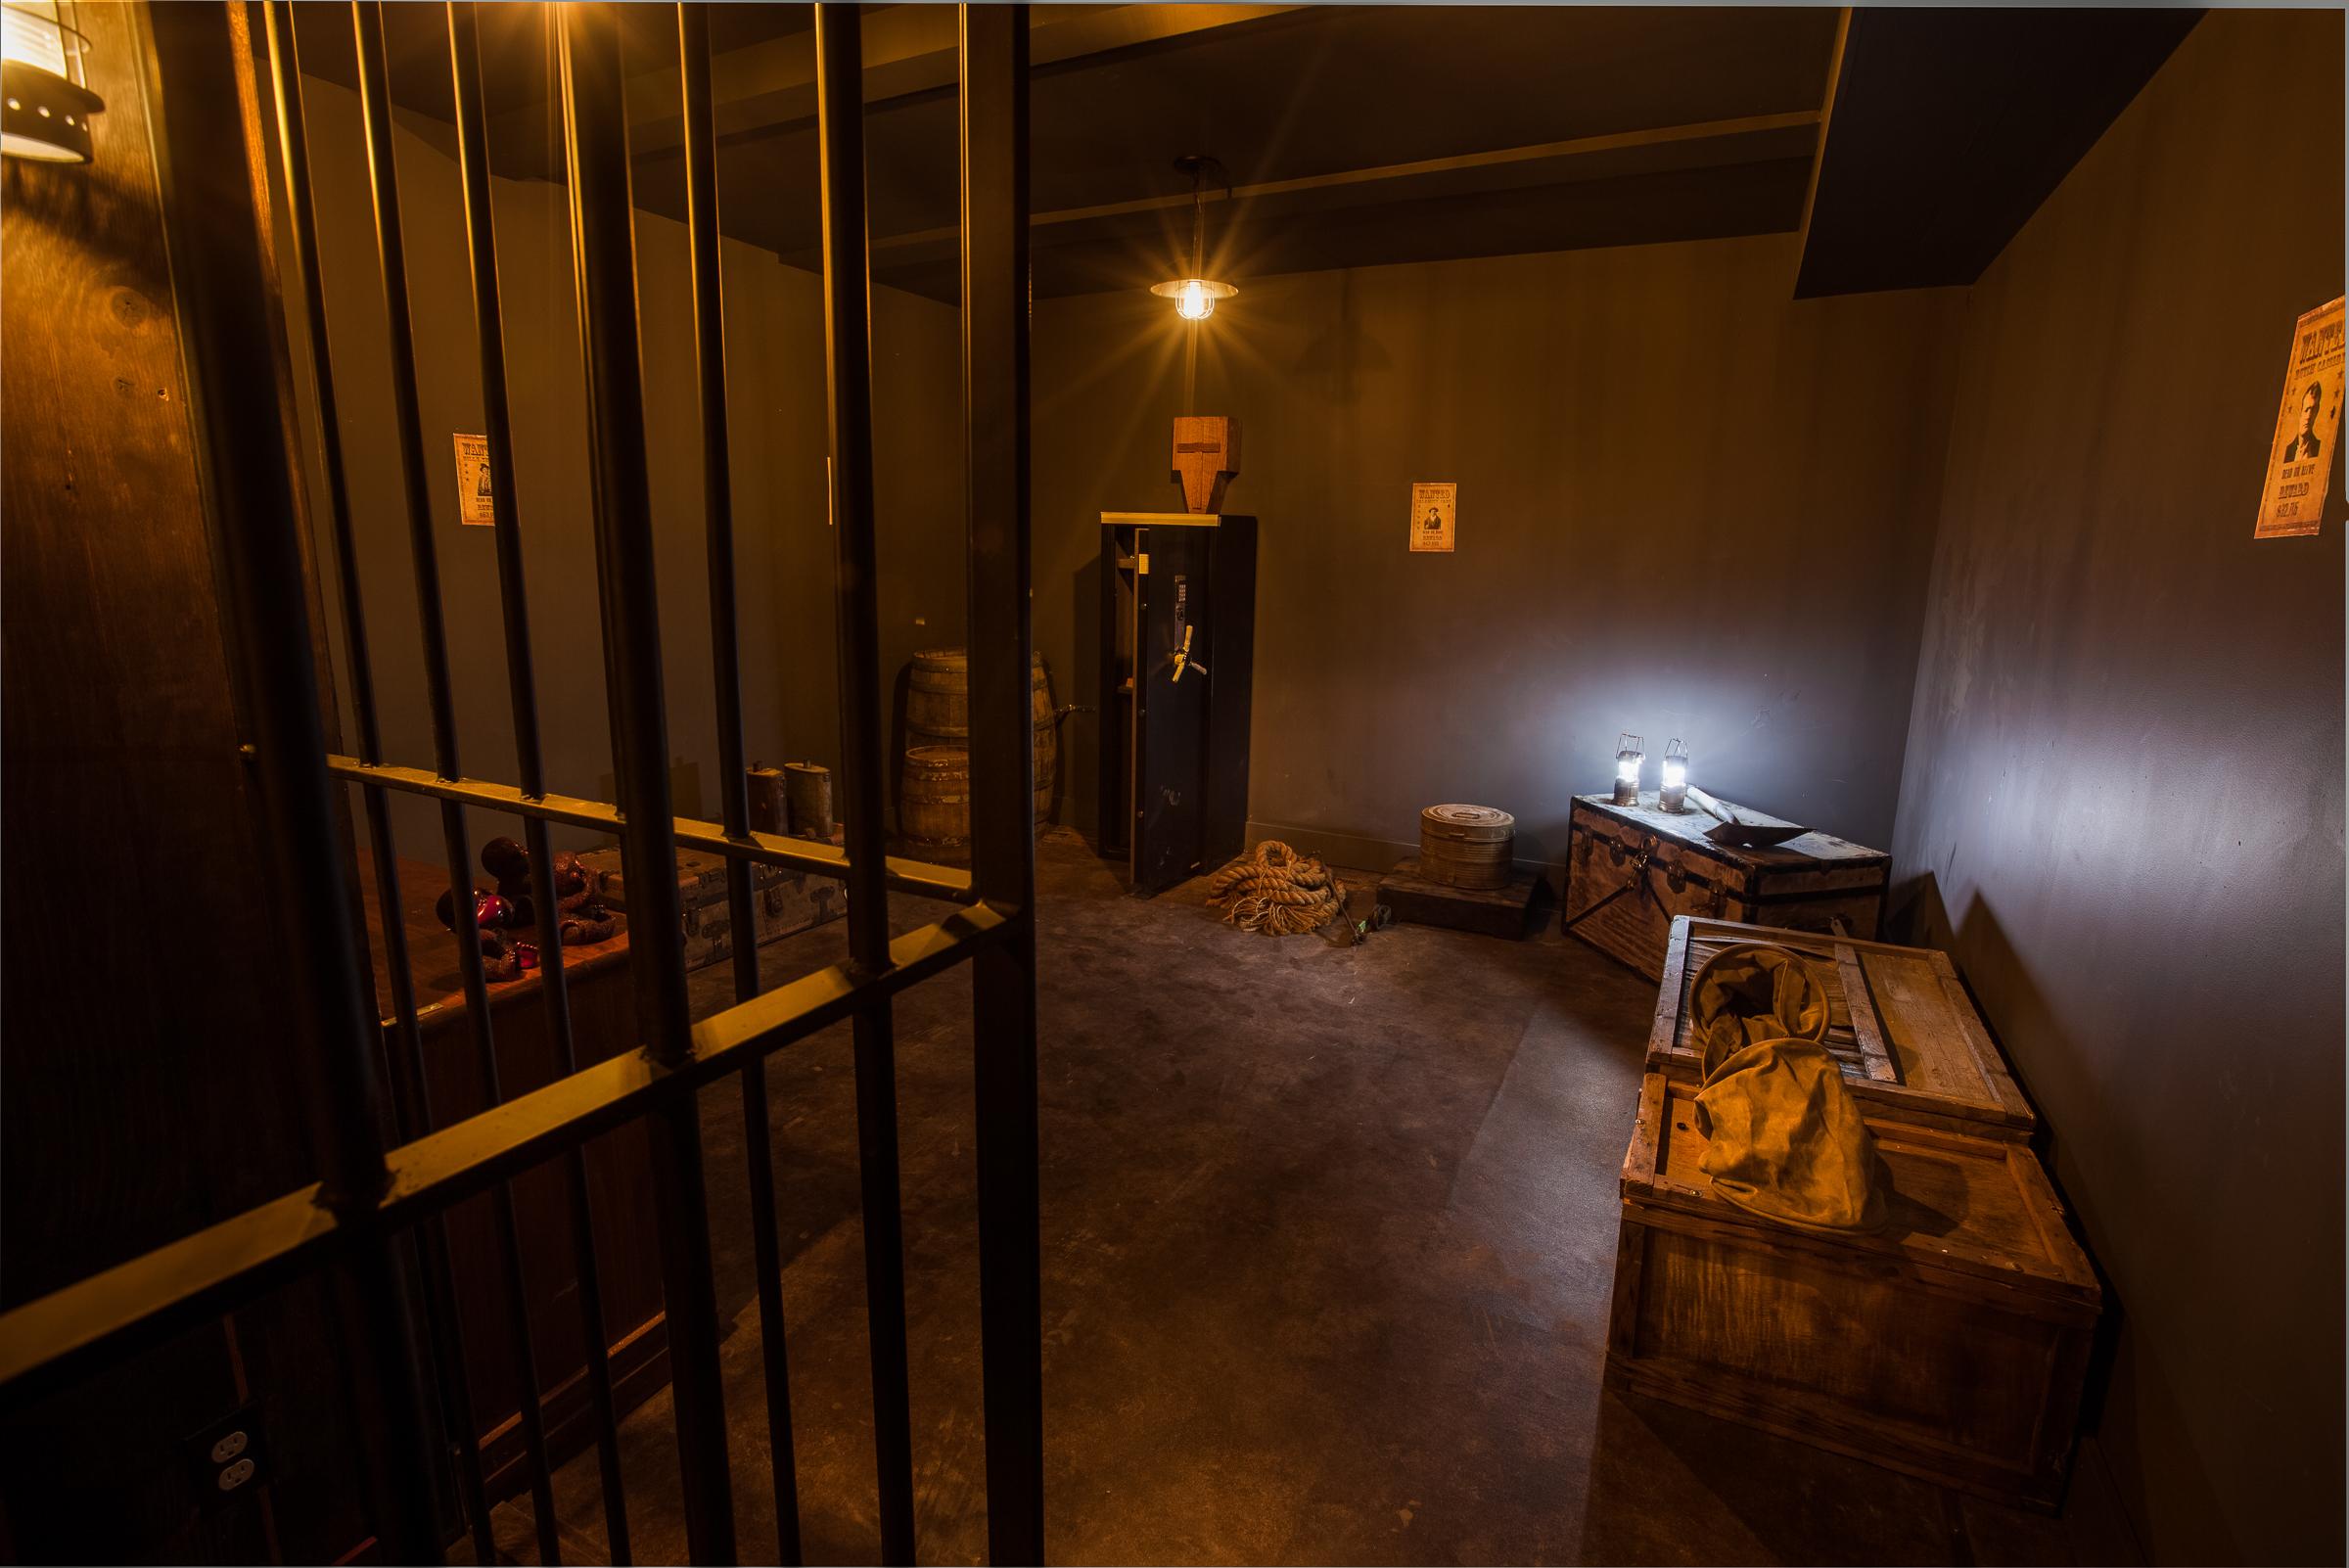 Image: The Great Train Heist / The Locked Room